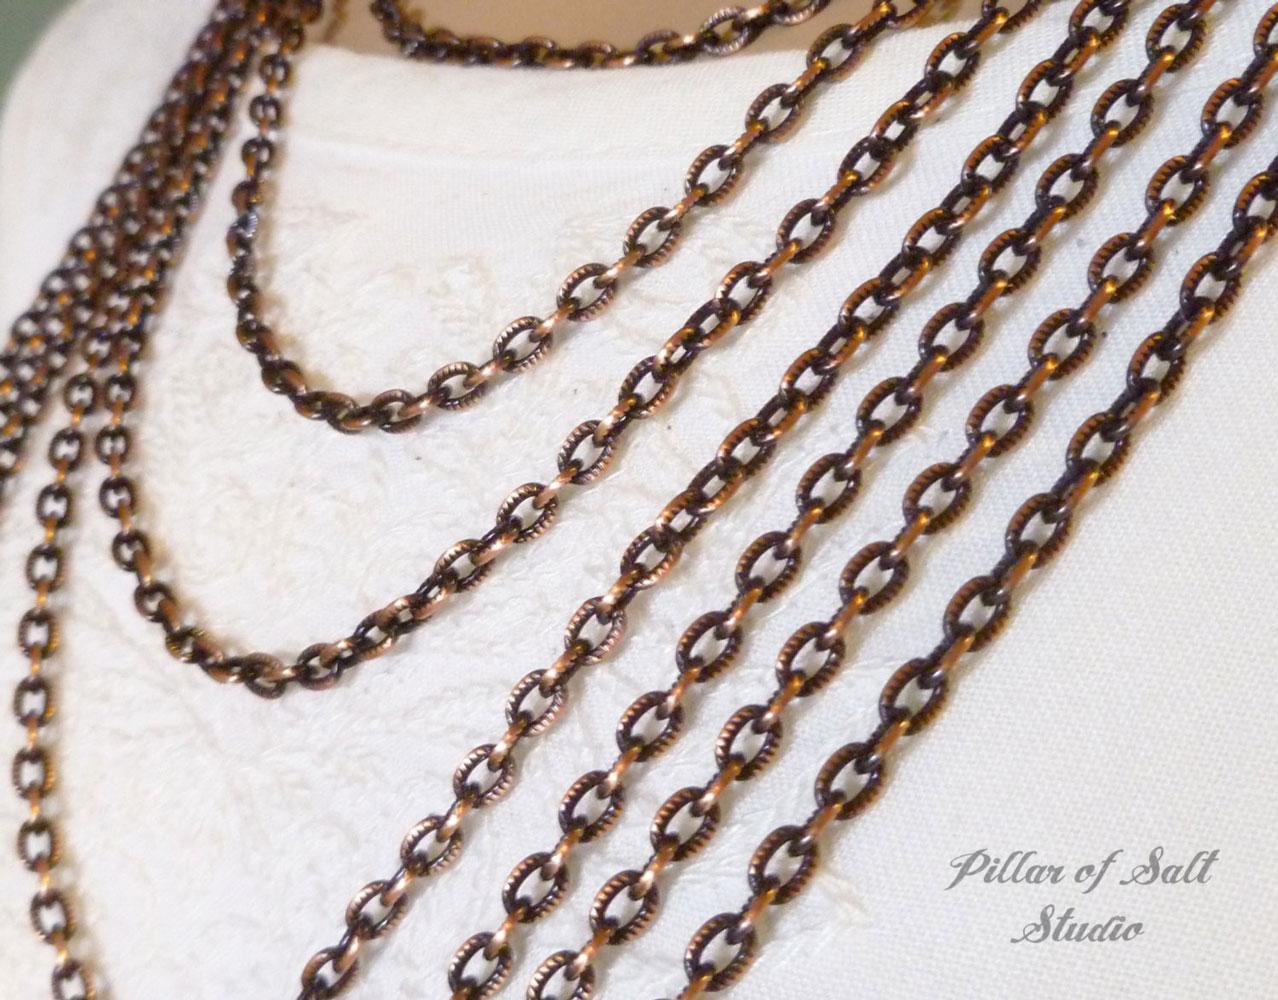 solid copper chain for pendants - Pillar of Salt Studio